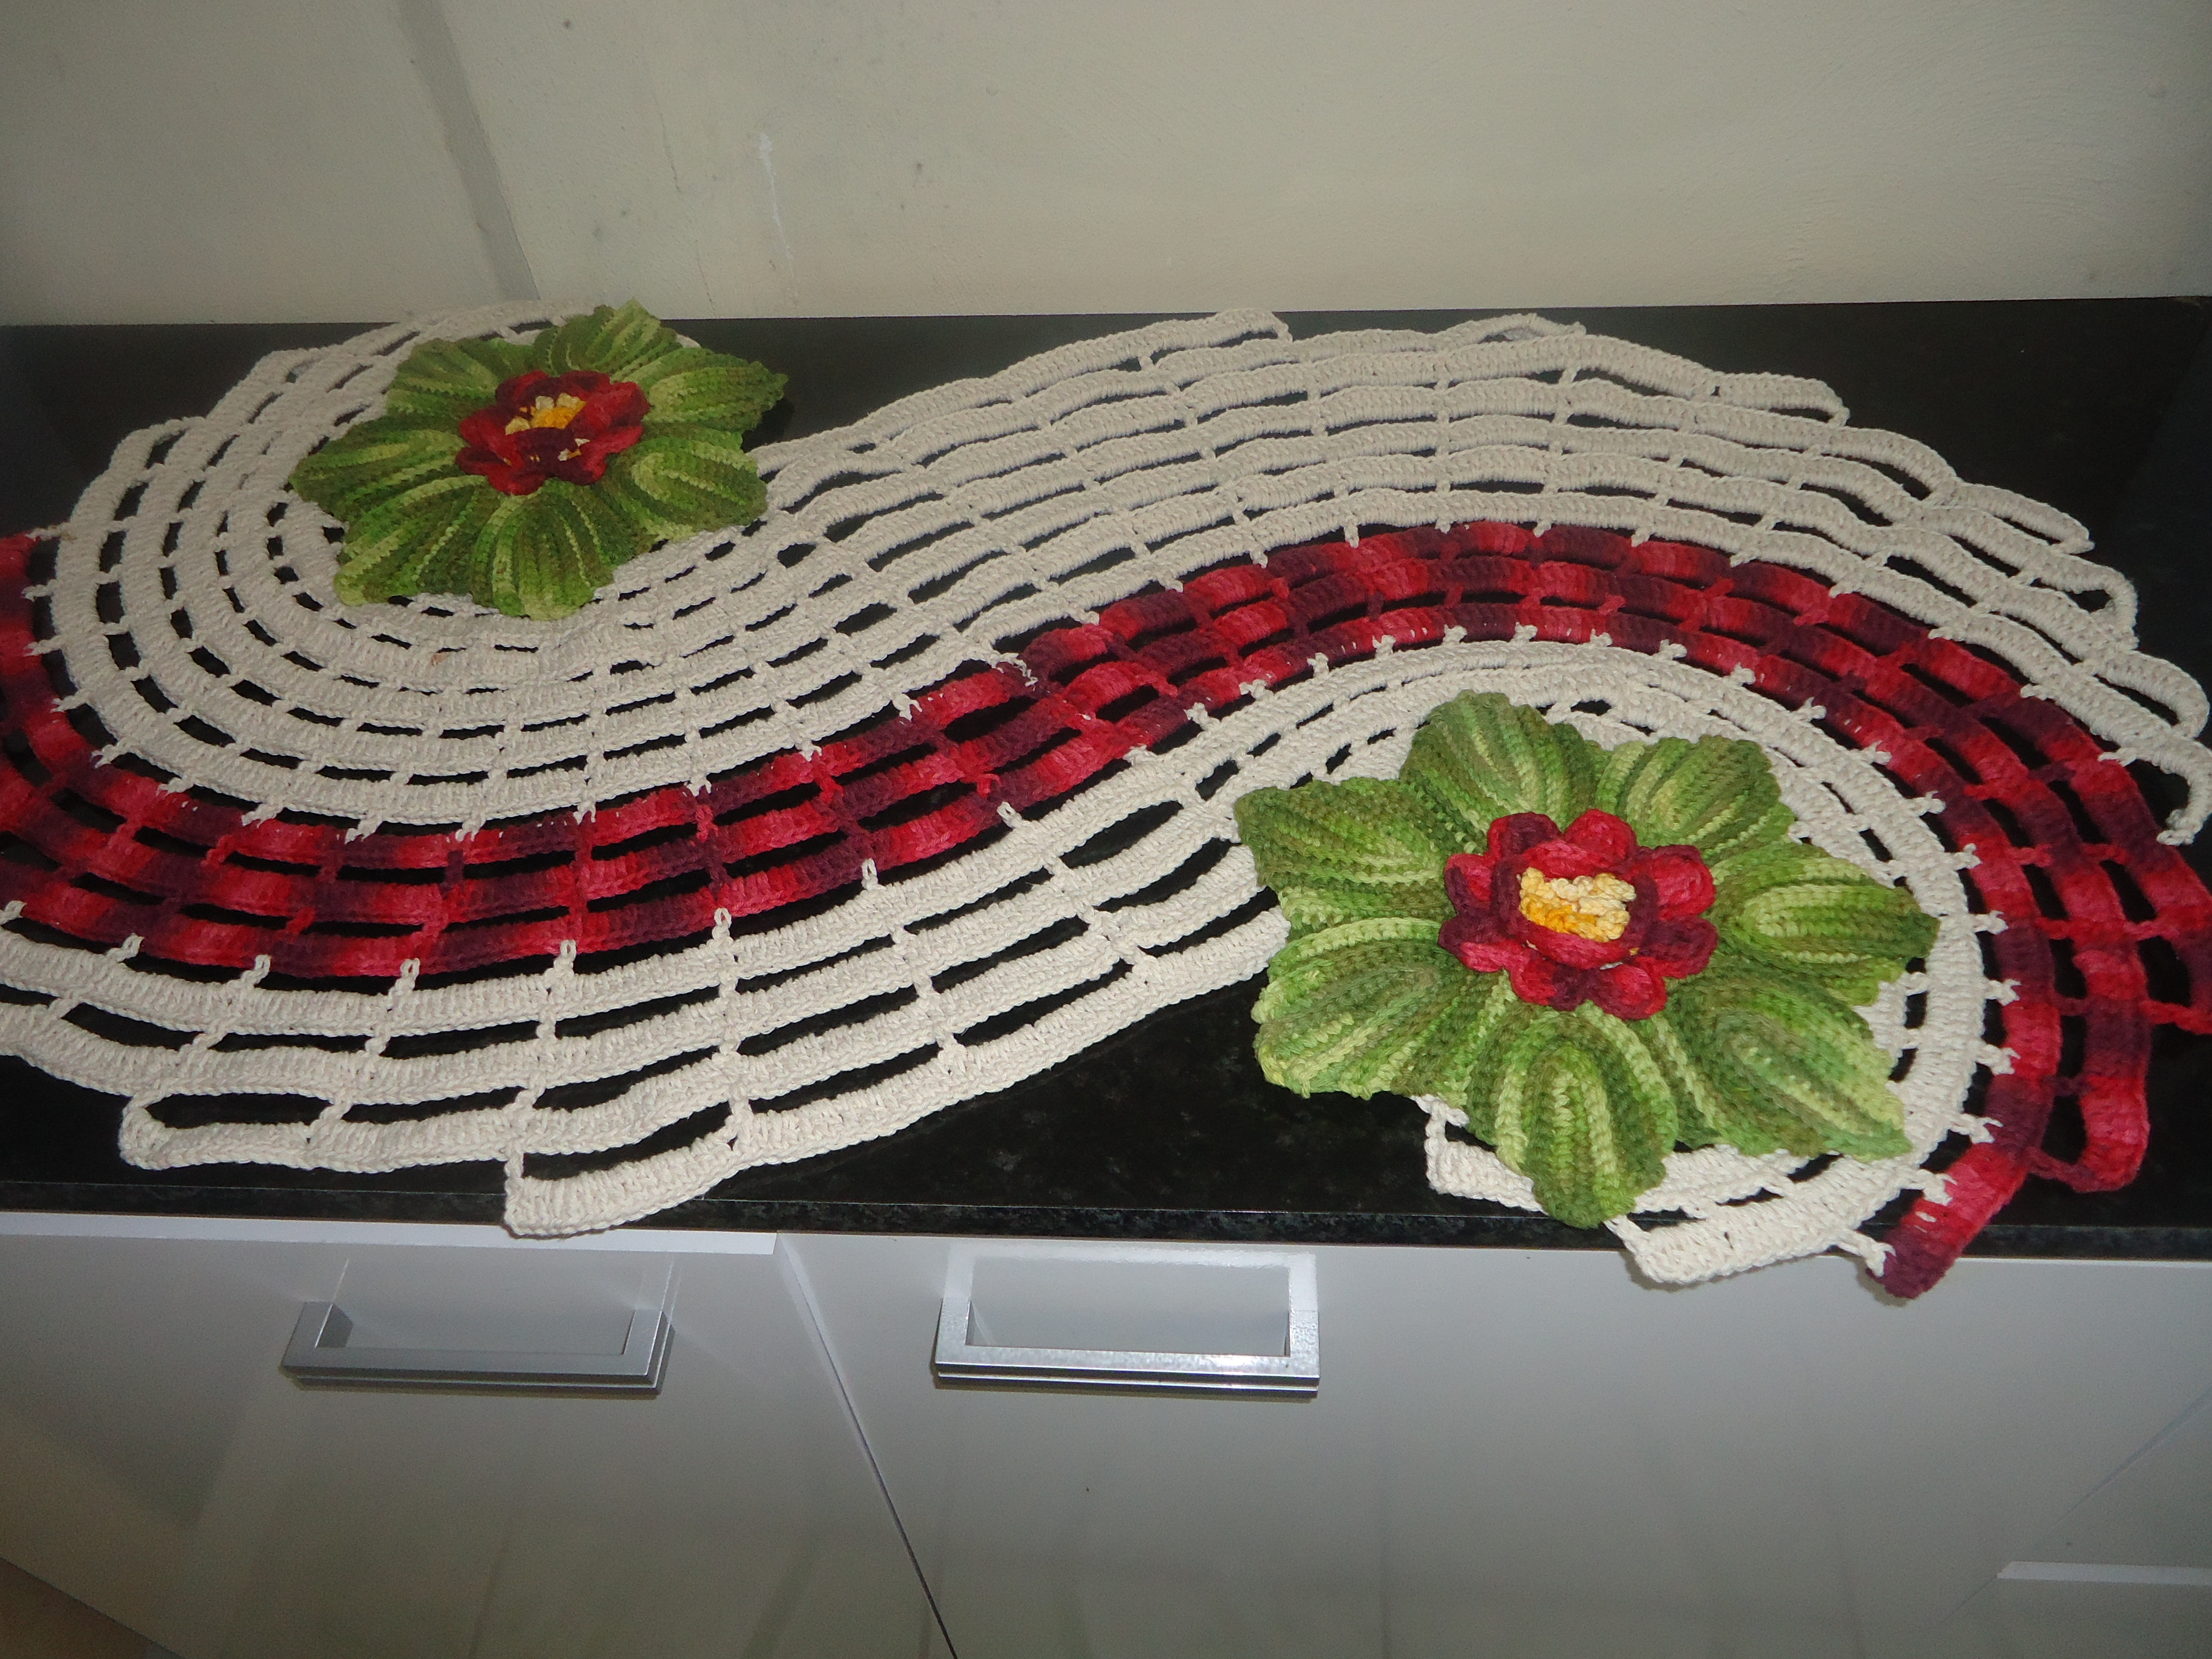 Caminho mesa ou tapete espiral edina nekipa croche elo7 for Tapete mesa